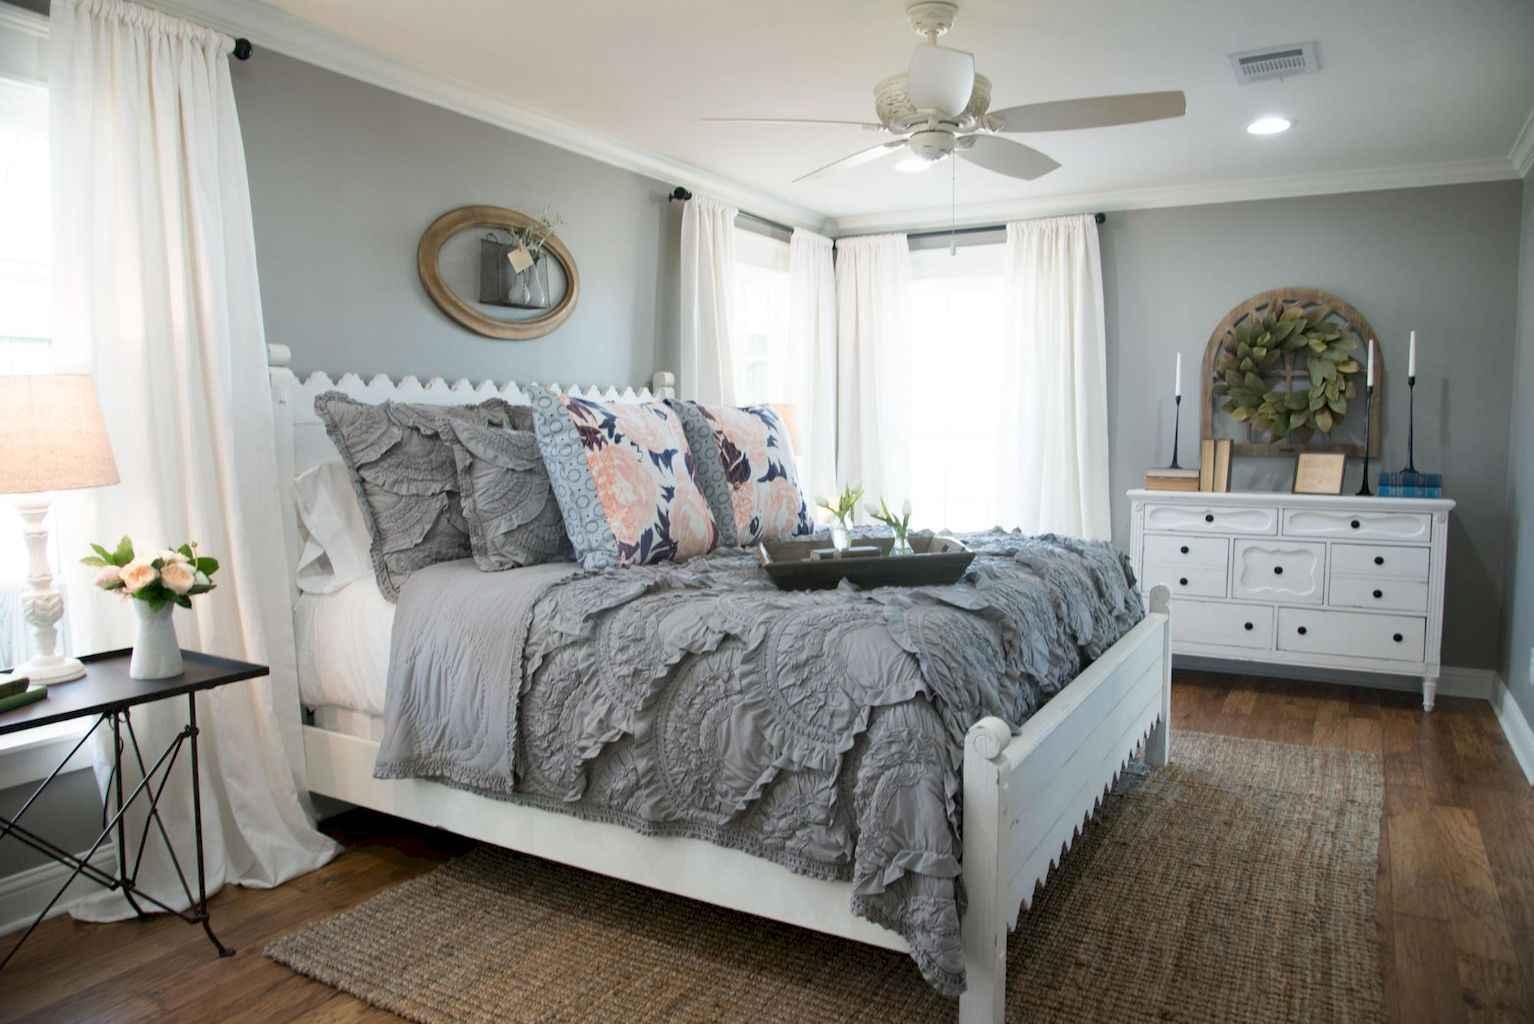 100 Stunning Farmhouse Master Bedroom Decor Ideas (47)